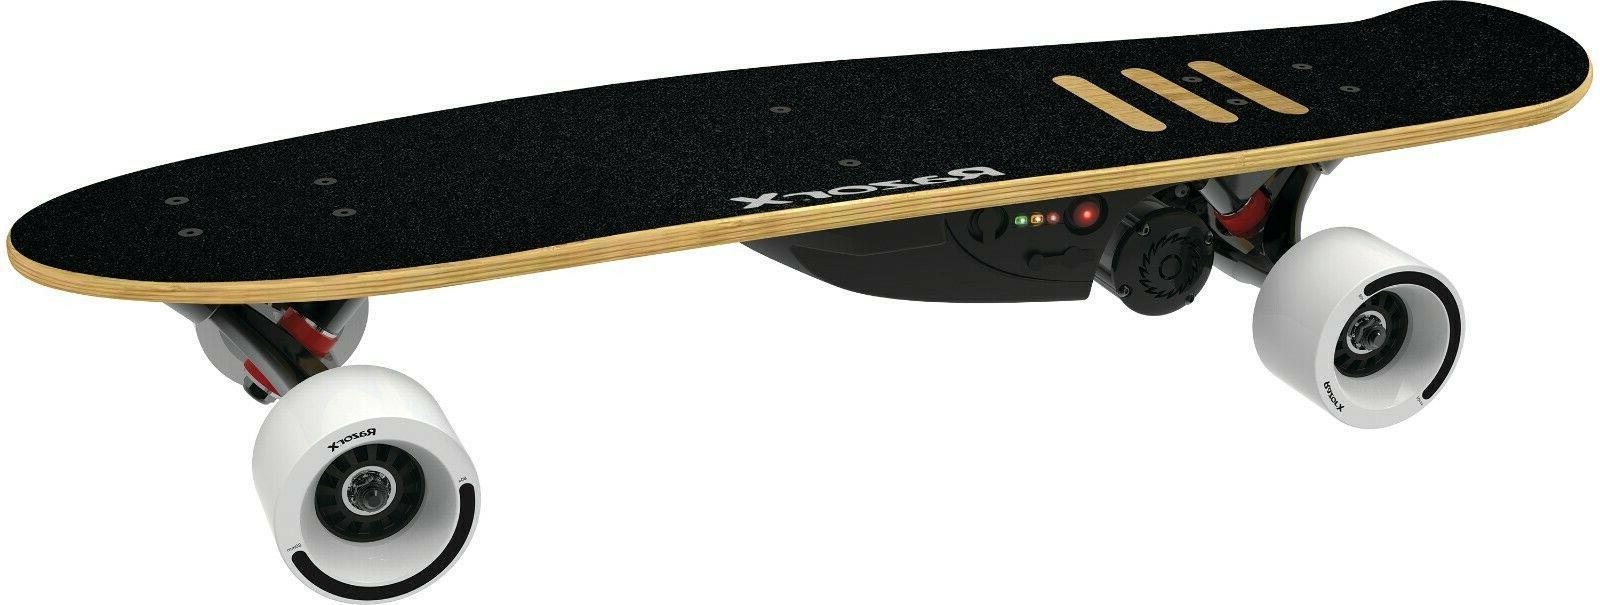 x electric skateboard cruiser wireless remote wrist